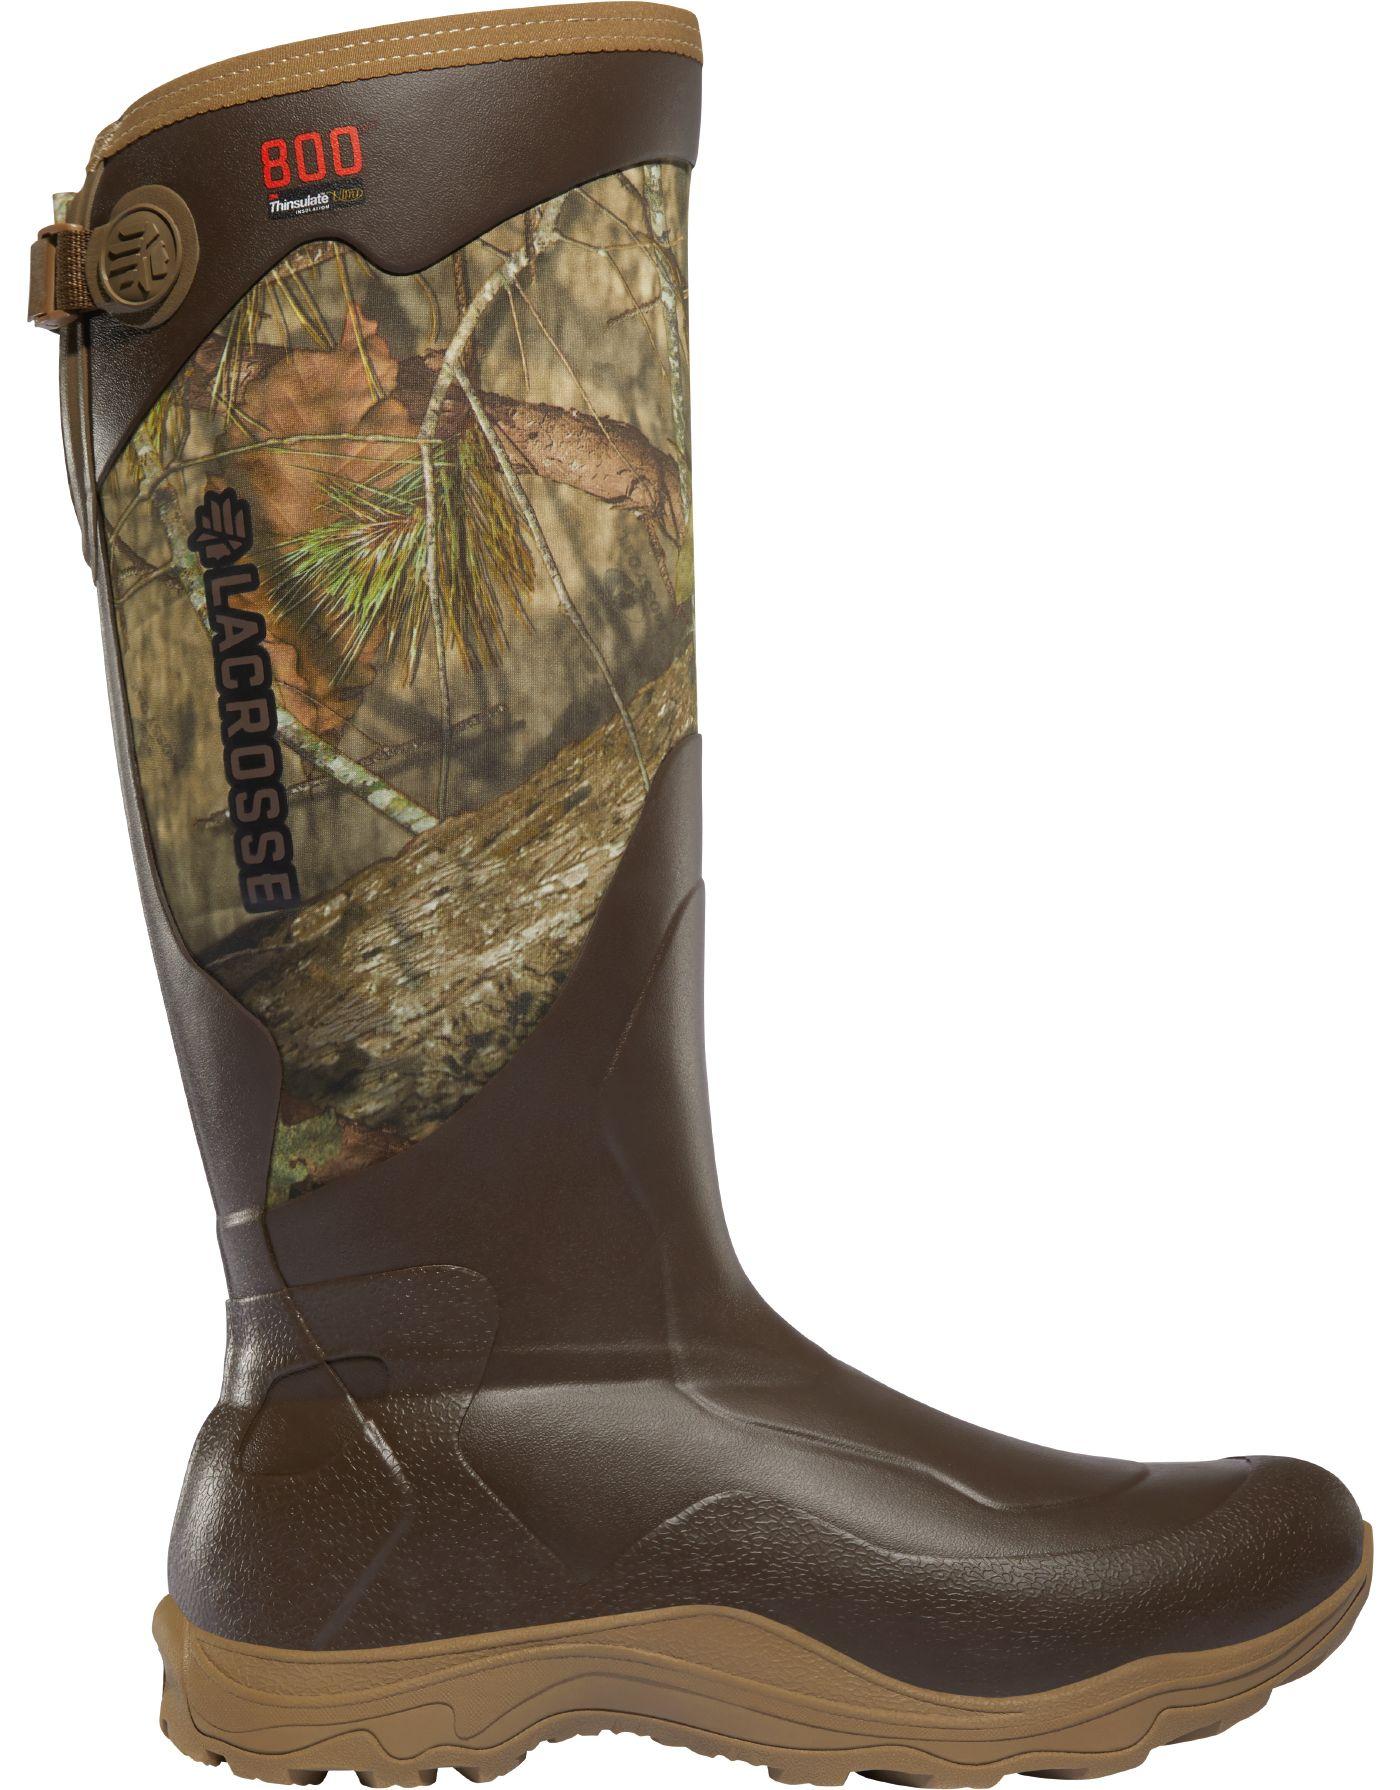 LaCrosse Men's Alpha Agility 17'' Mossy Oak Break-Up Country 800g Rubber Hunting Boots